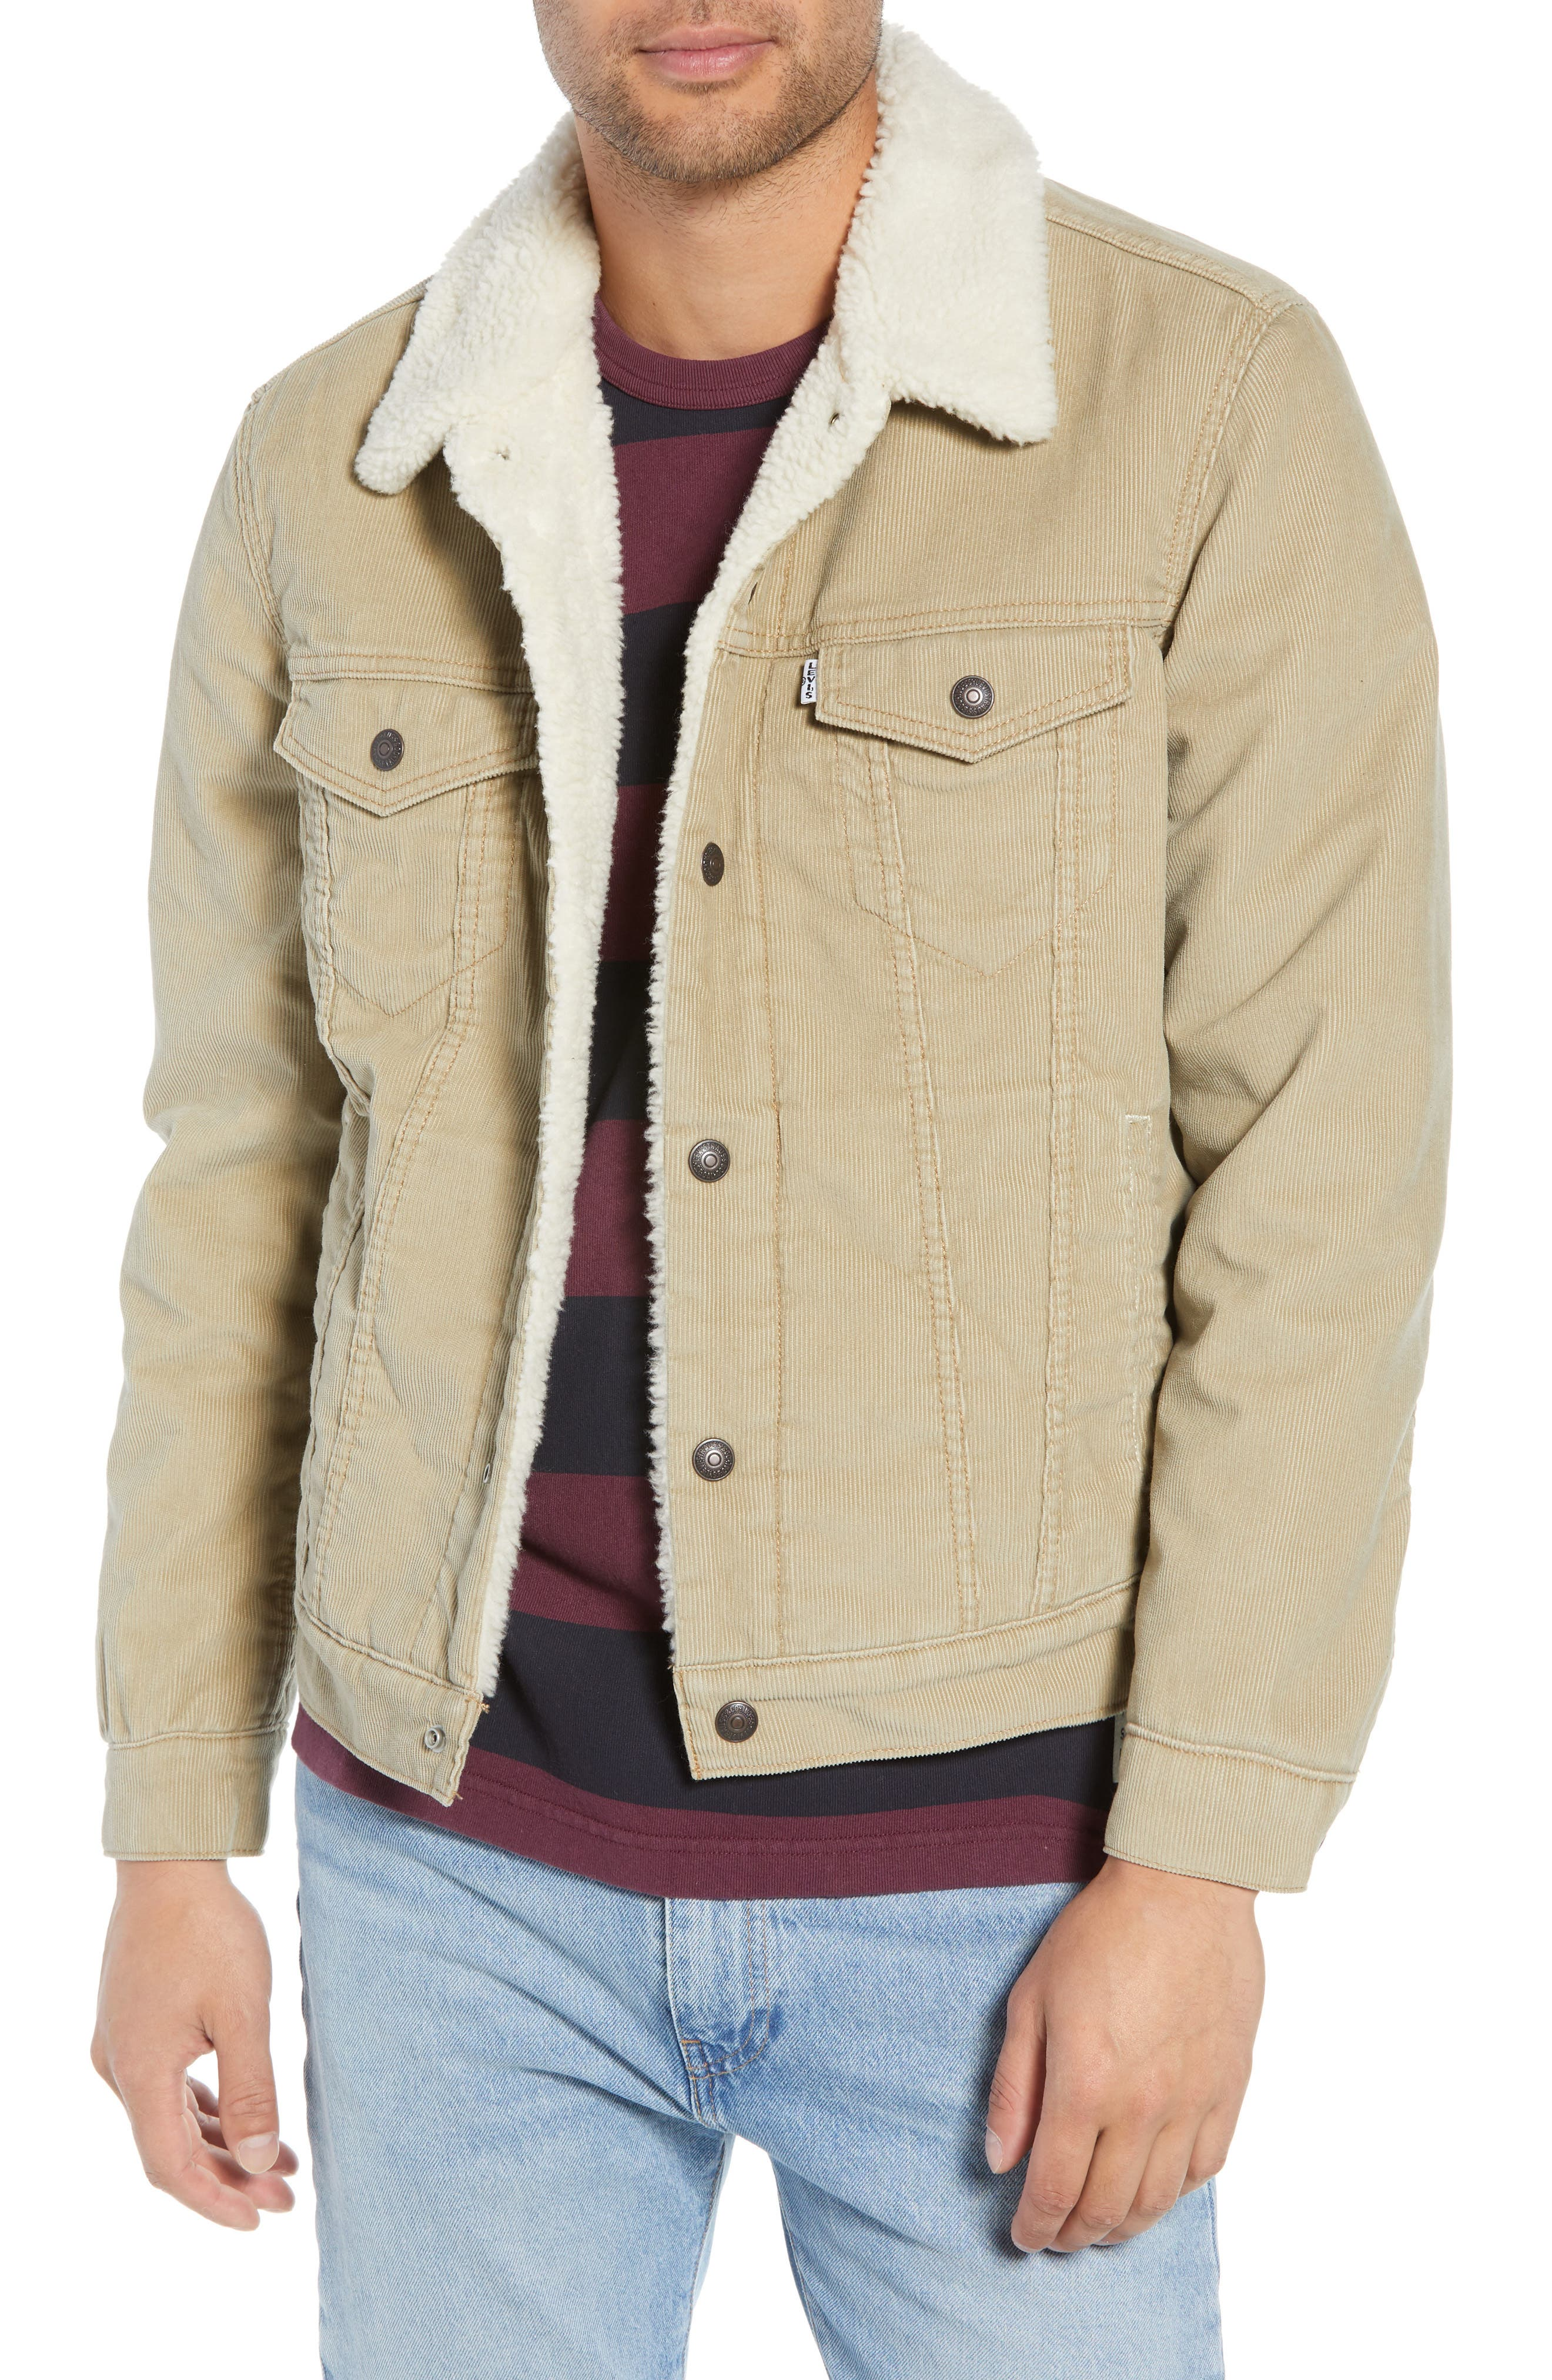 Type 3 Fleece Lined Trucker Jacket,                         Main,                         color, TRUE CHINO CORD BETTER